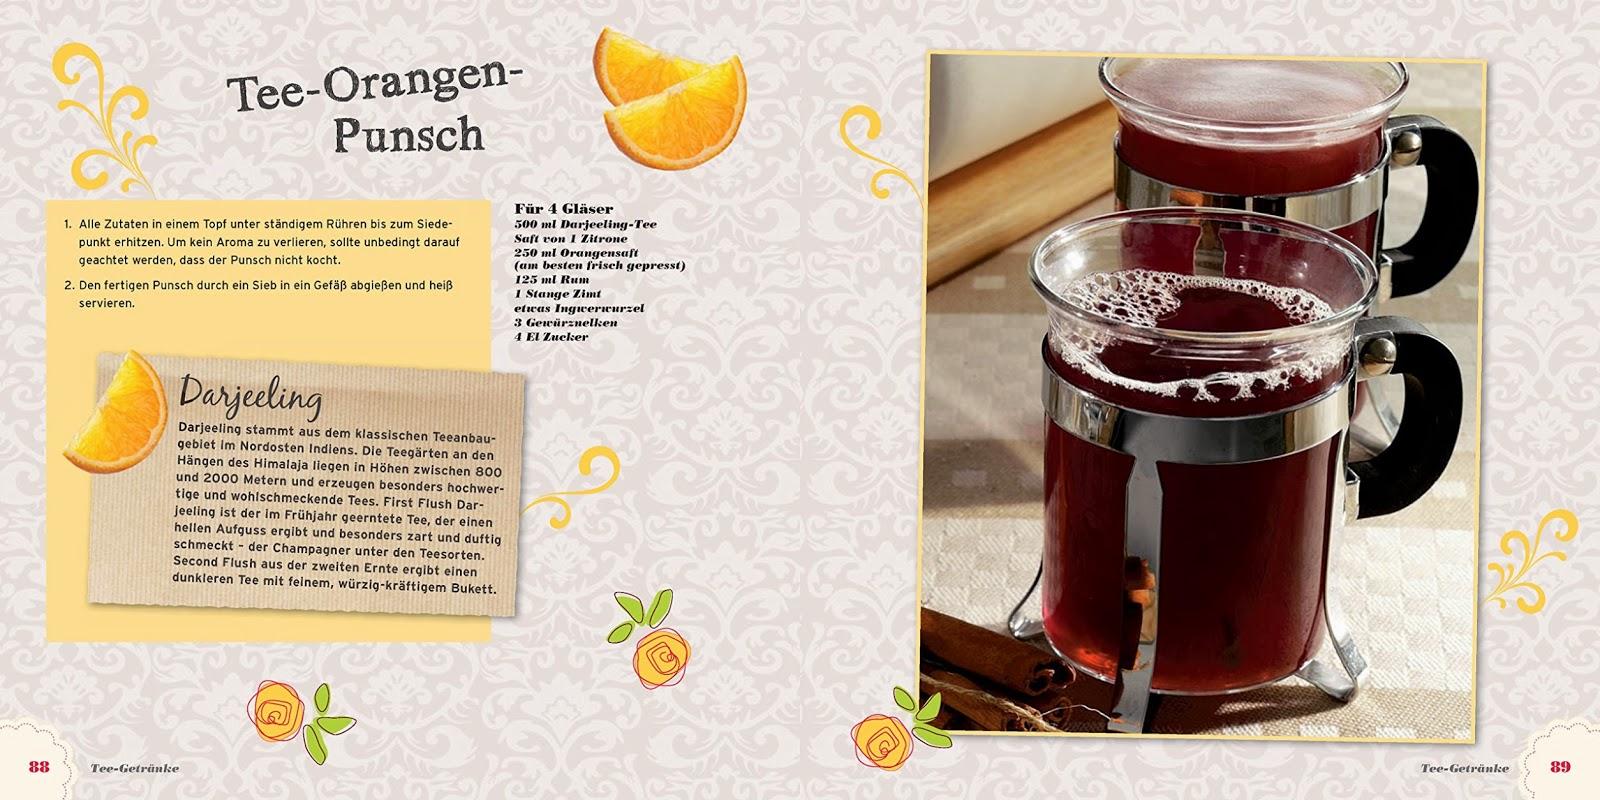 http://www.naumann-goebel.de/Teatime_-_Scones%2C_Konfekt_%26_feines_Geb%C3%A4ck.htm?BookID=5991